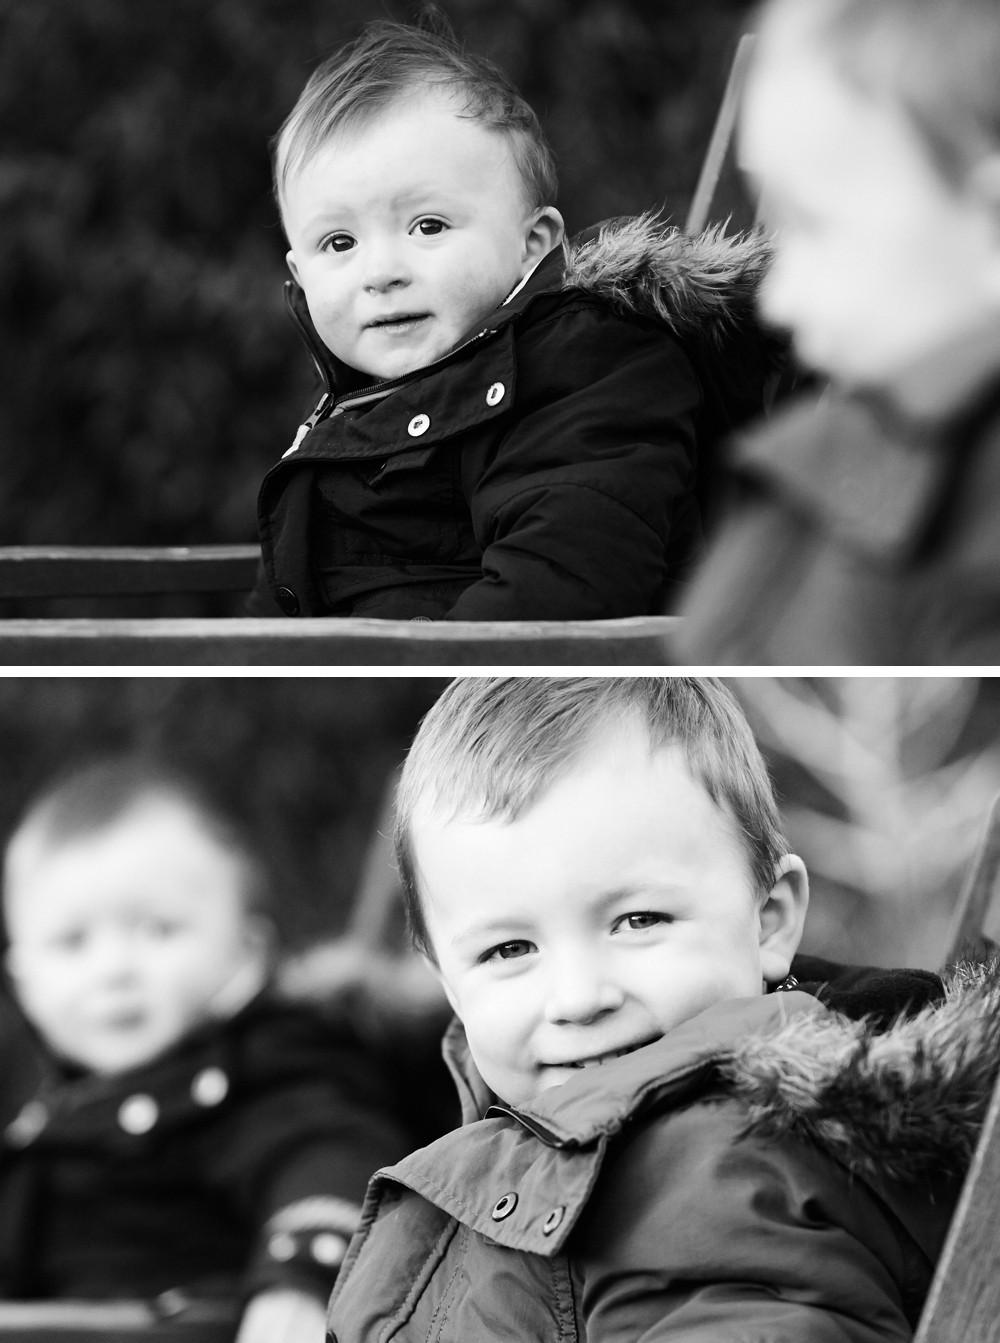 colchesterportraitphotographer-016.jpg